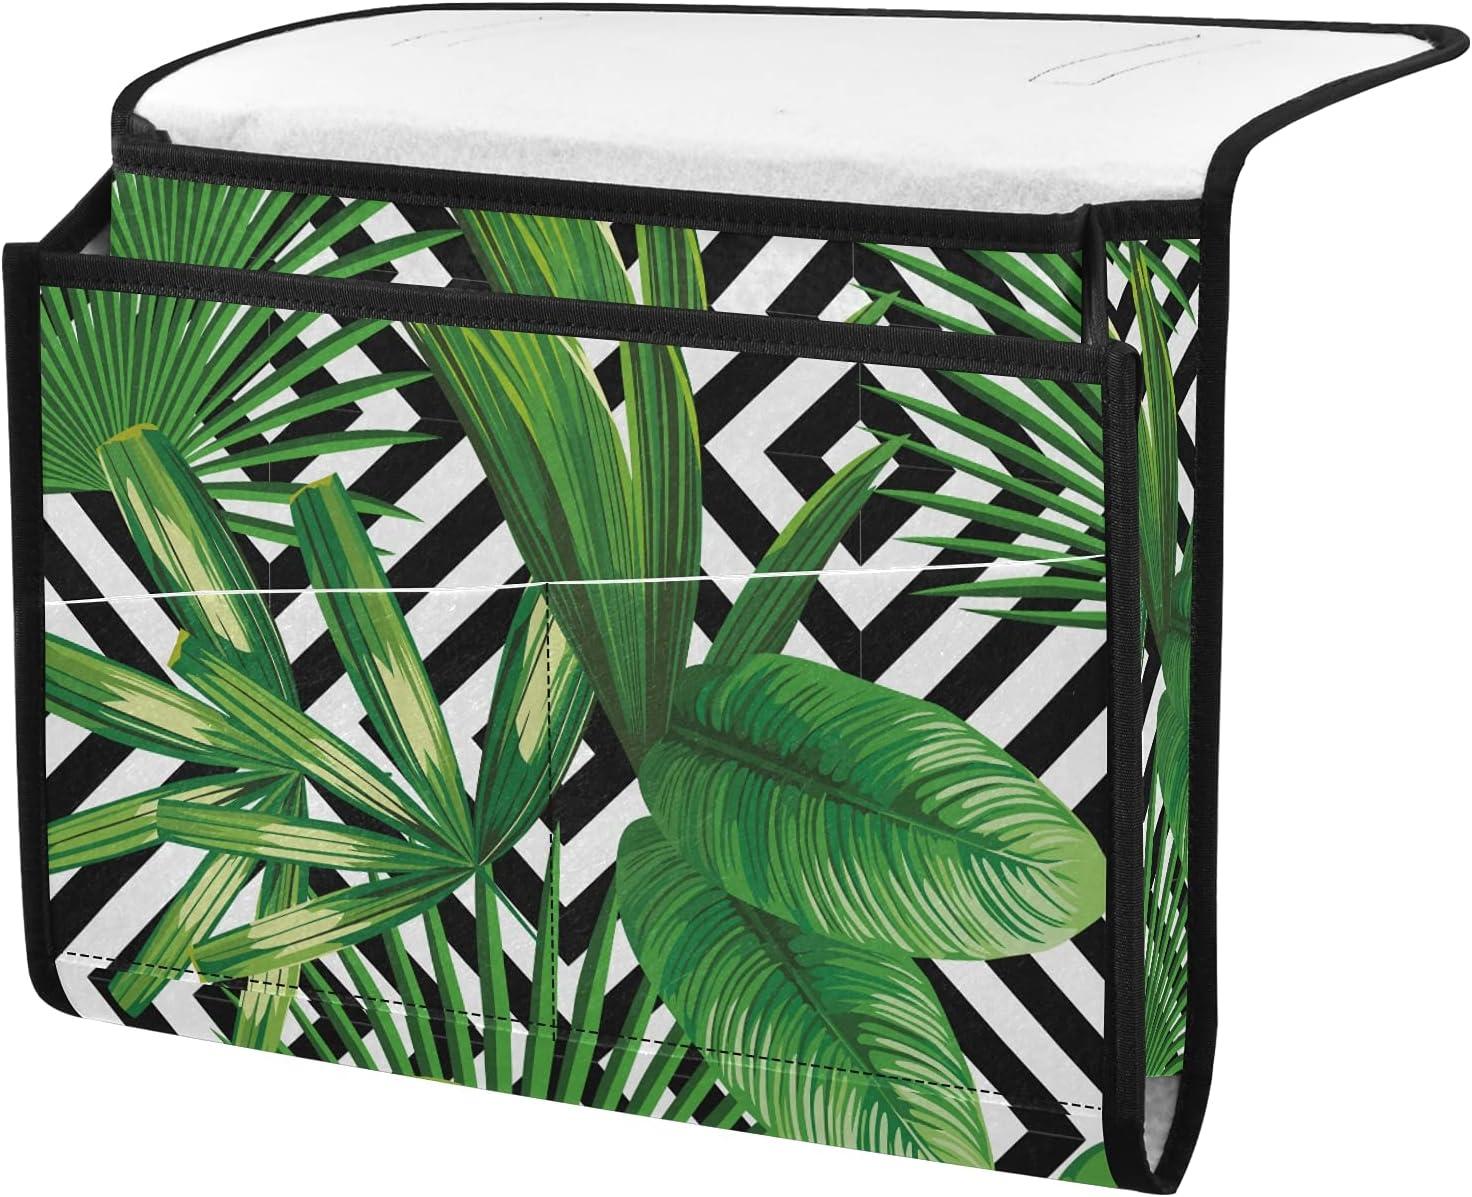 senya Challenge the lowest price of Japan ☆ Palm Leaves trust Jungle Storage Organizer Plant Bedside